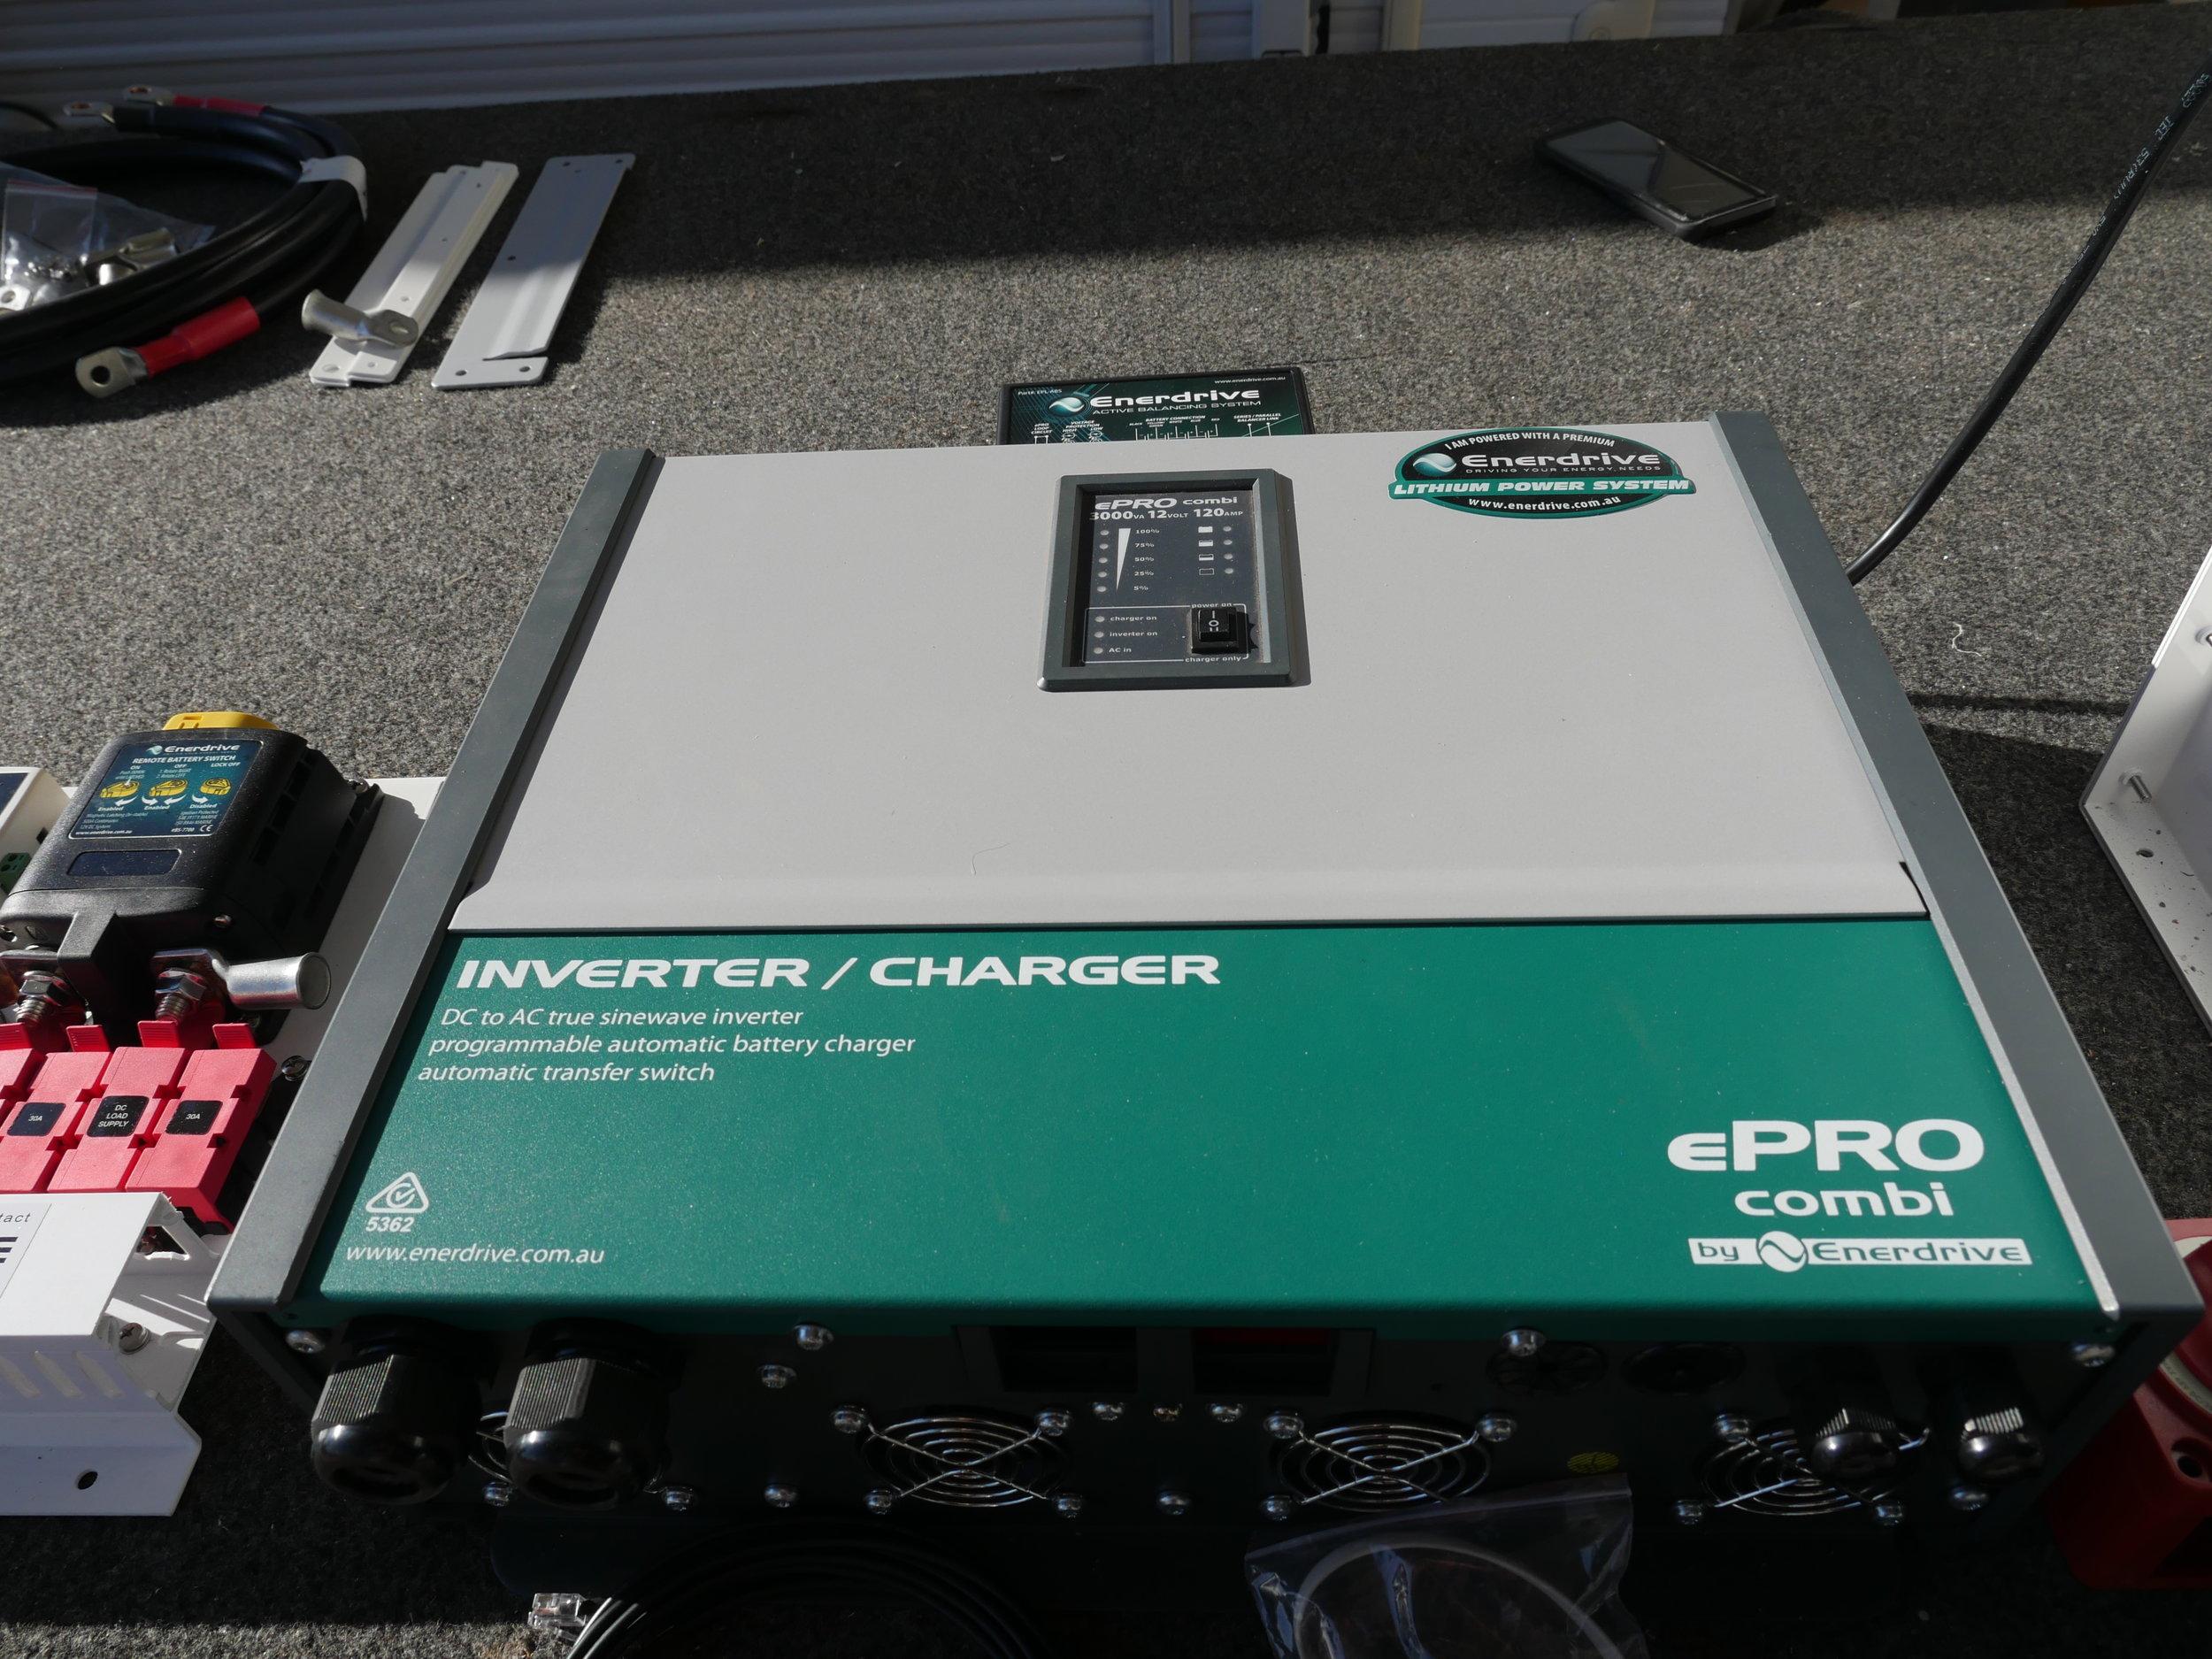 Inverter/charger